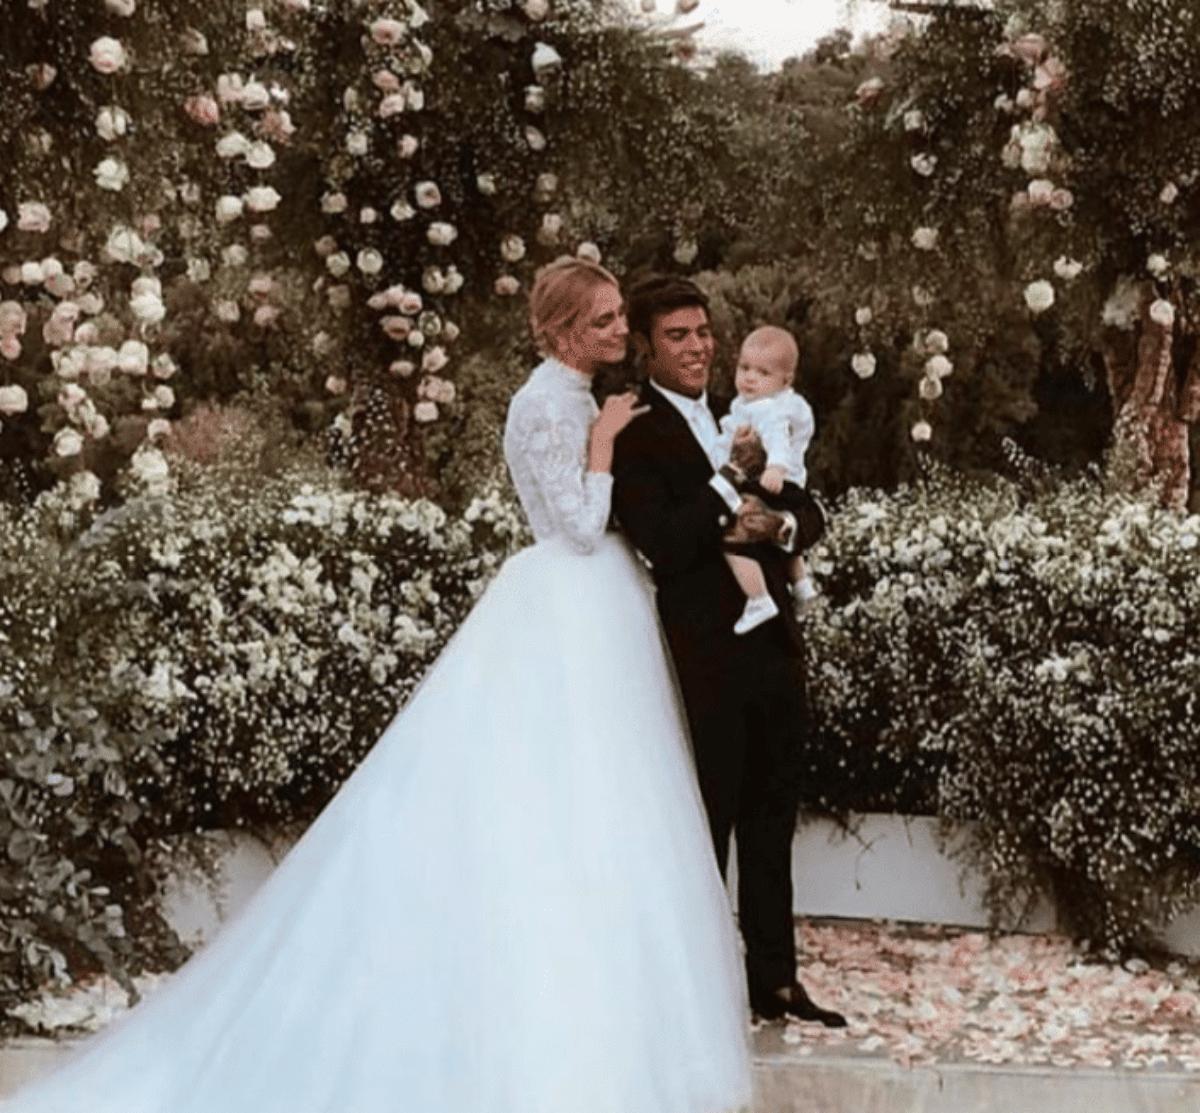 b2852a348b0c Matrimonio Chiara Ferragni Fedez